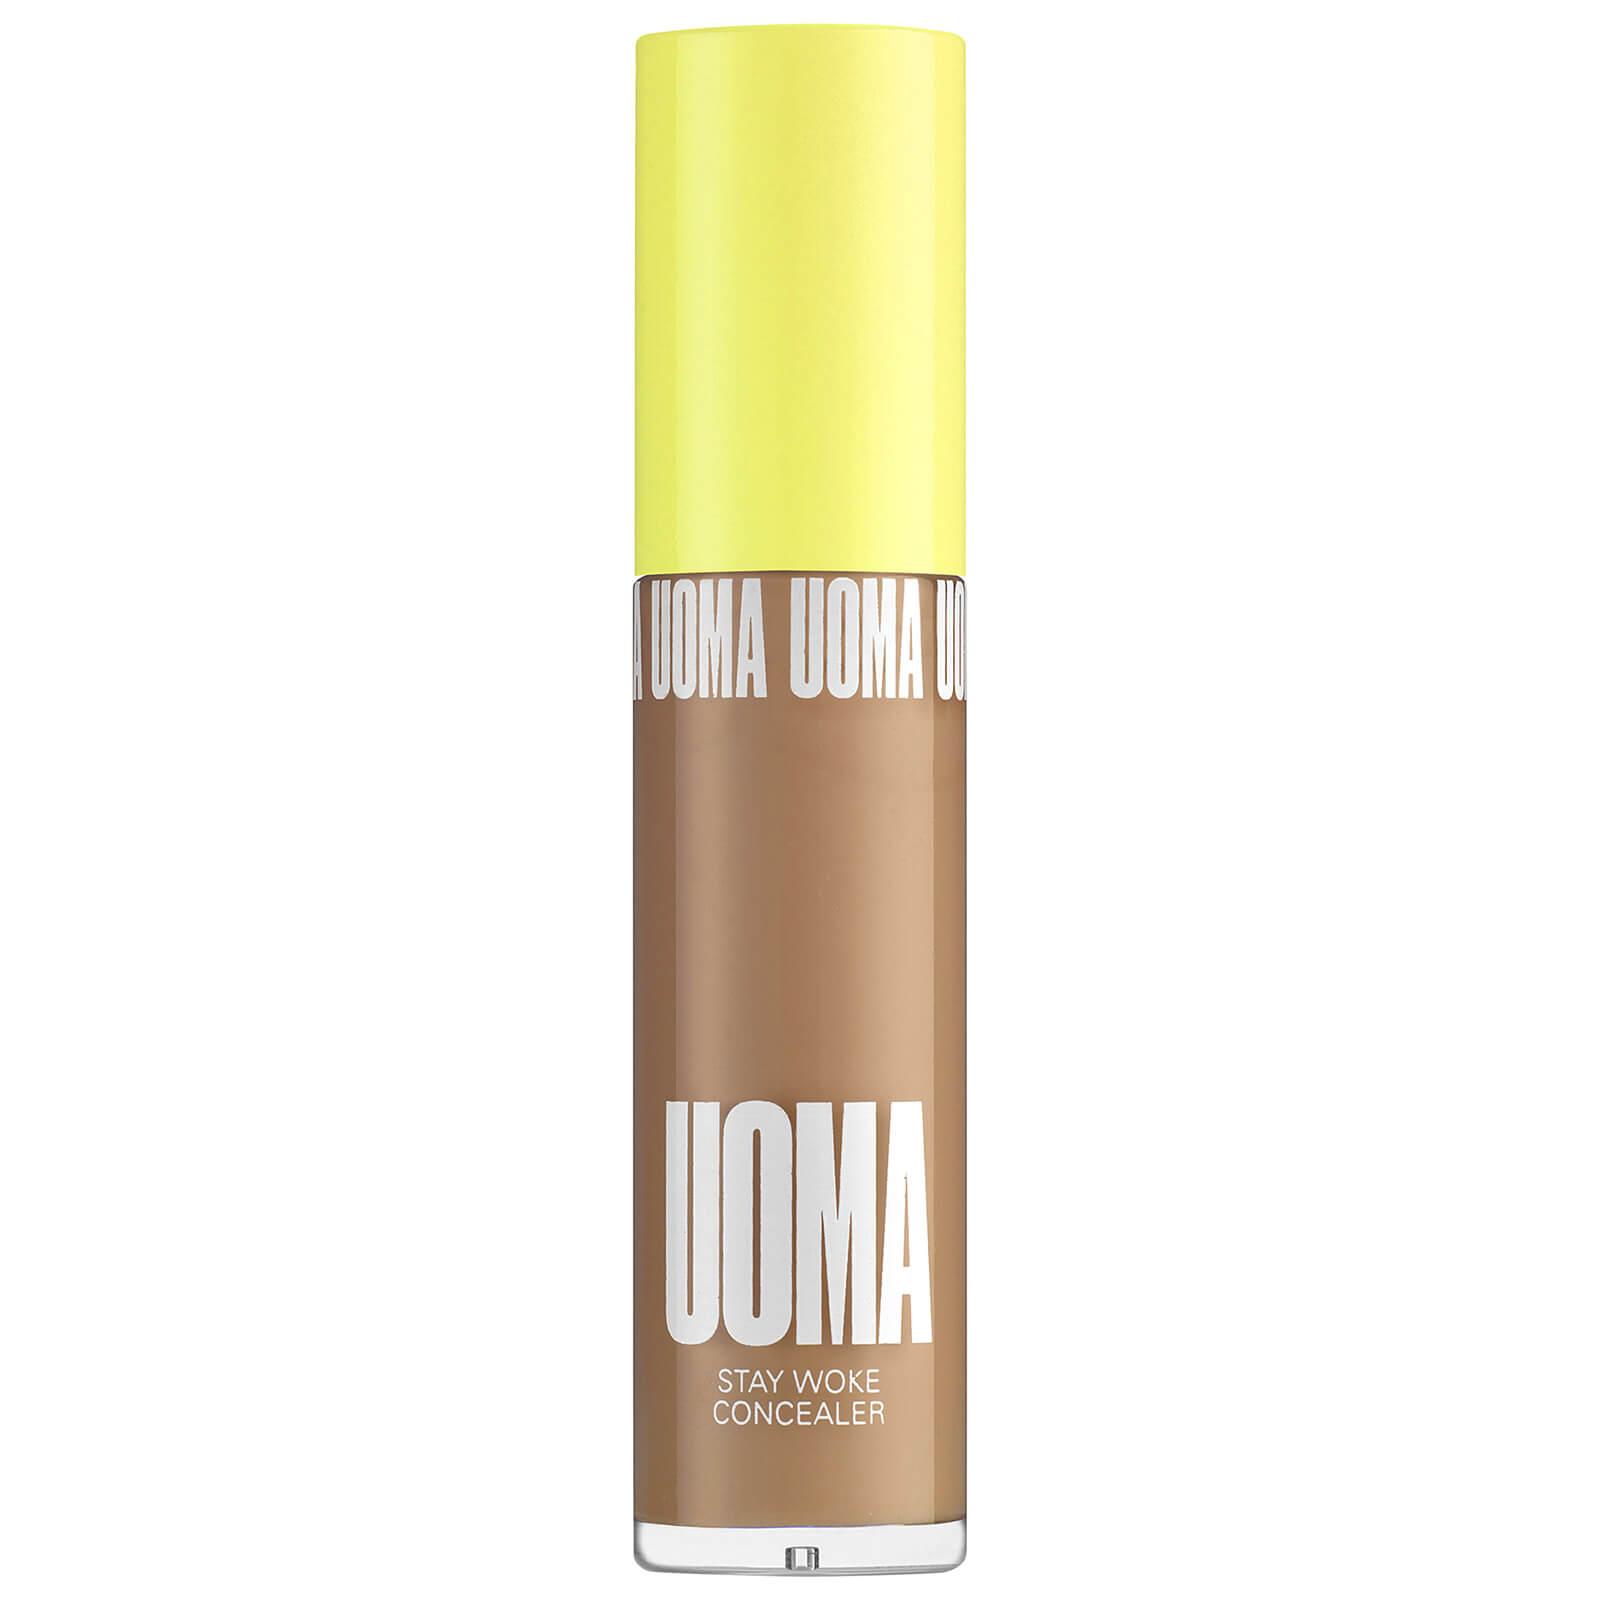 UOMA Beauty Stay Woke Luminous Brightening Concealer 30ml (Various Shades) - Bronze Venus T2